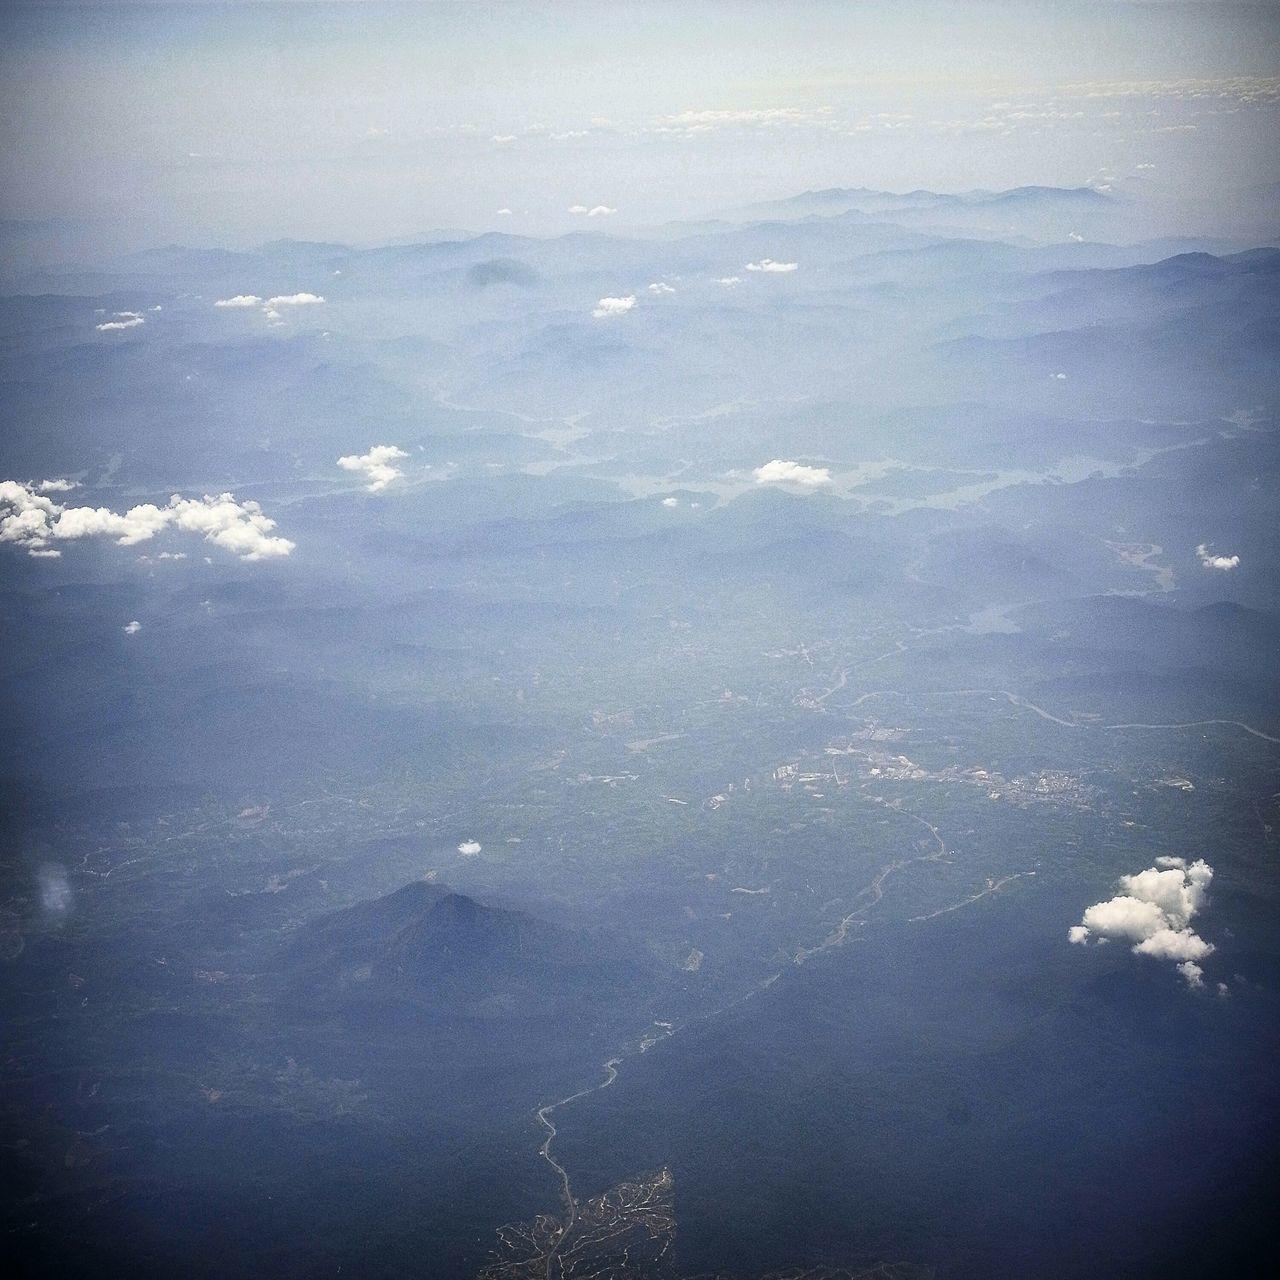 Myanmar To Kuala Lumpur Birdeyeview Fromaeroplane Cmmaung Cmmaung.me Ricoh Gxr